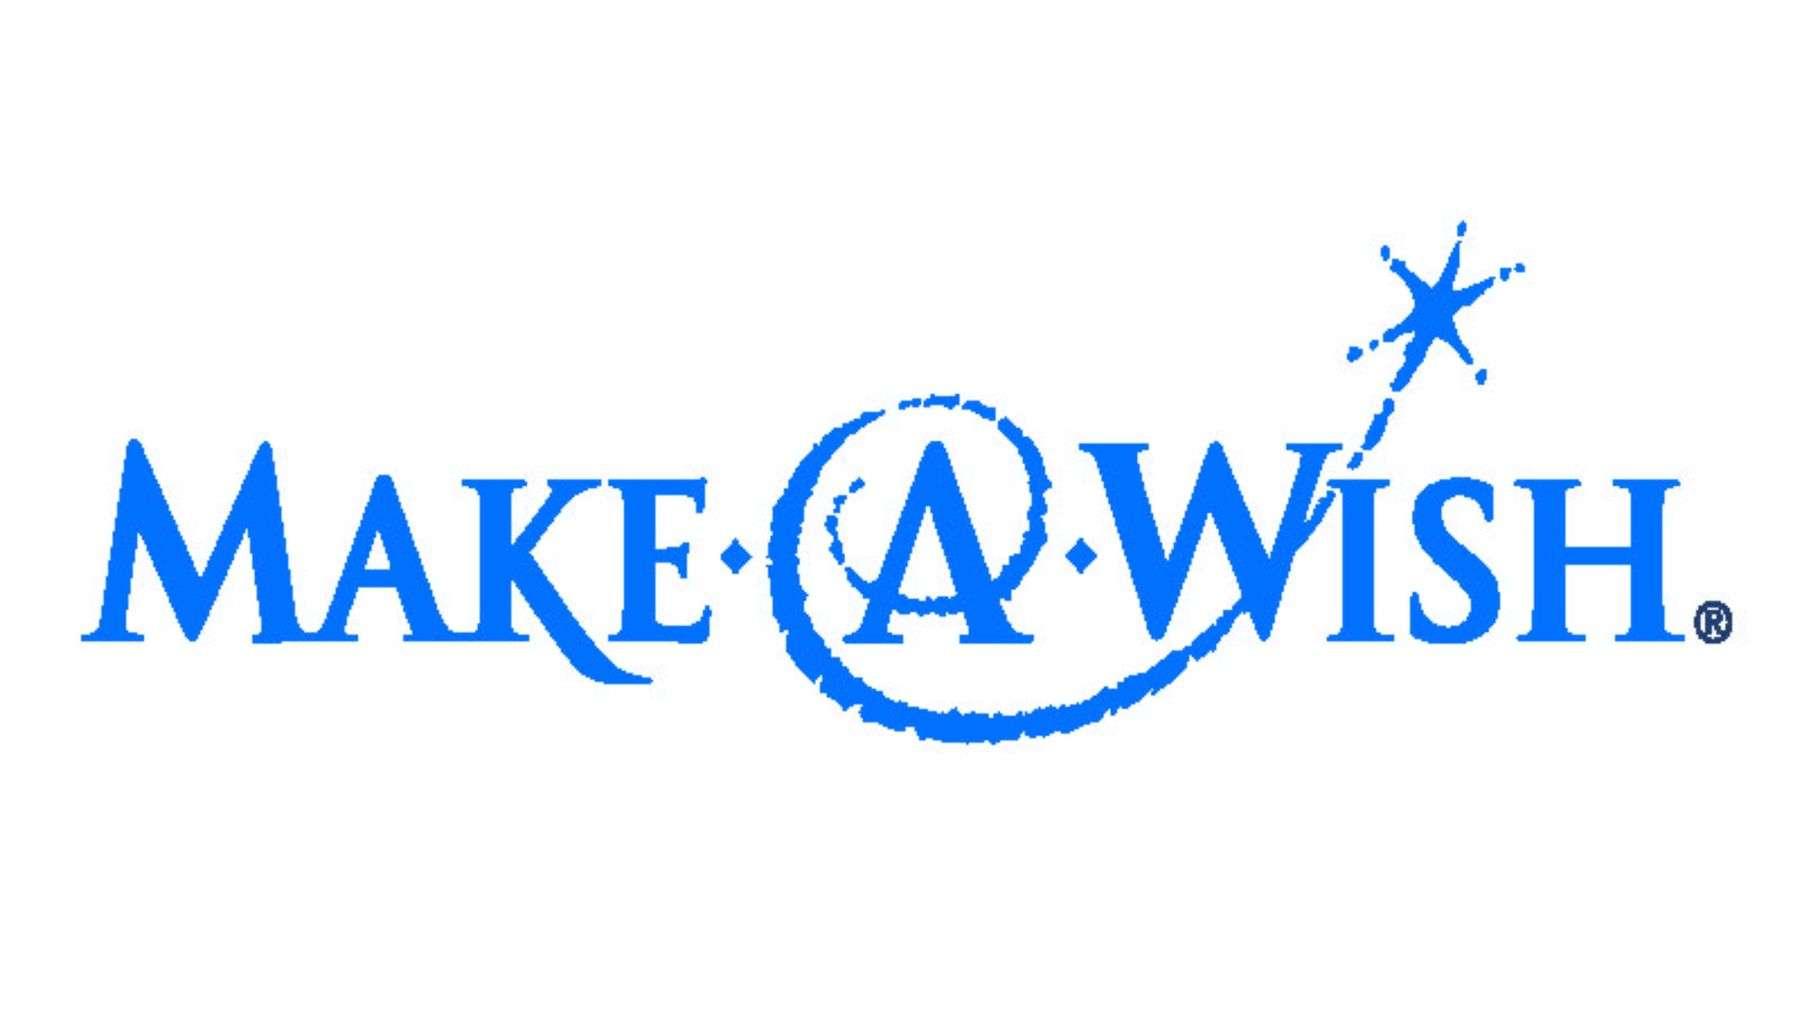 1404248947000-make-a-wish-102-logo.jpg